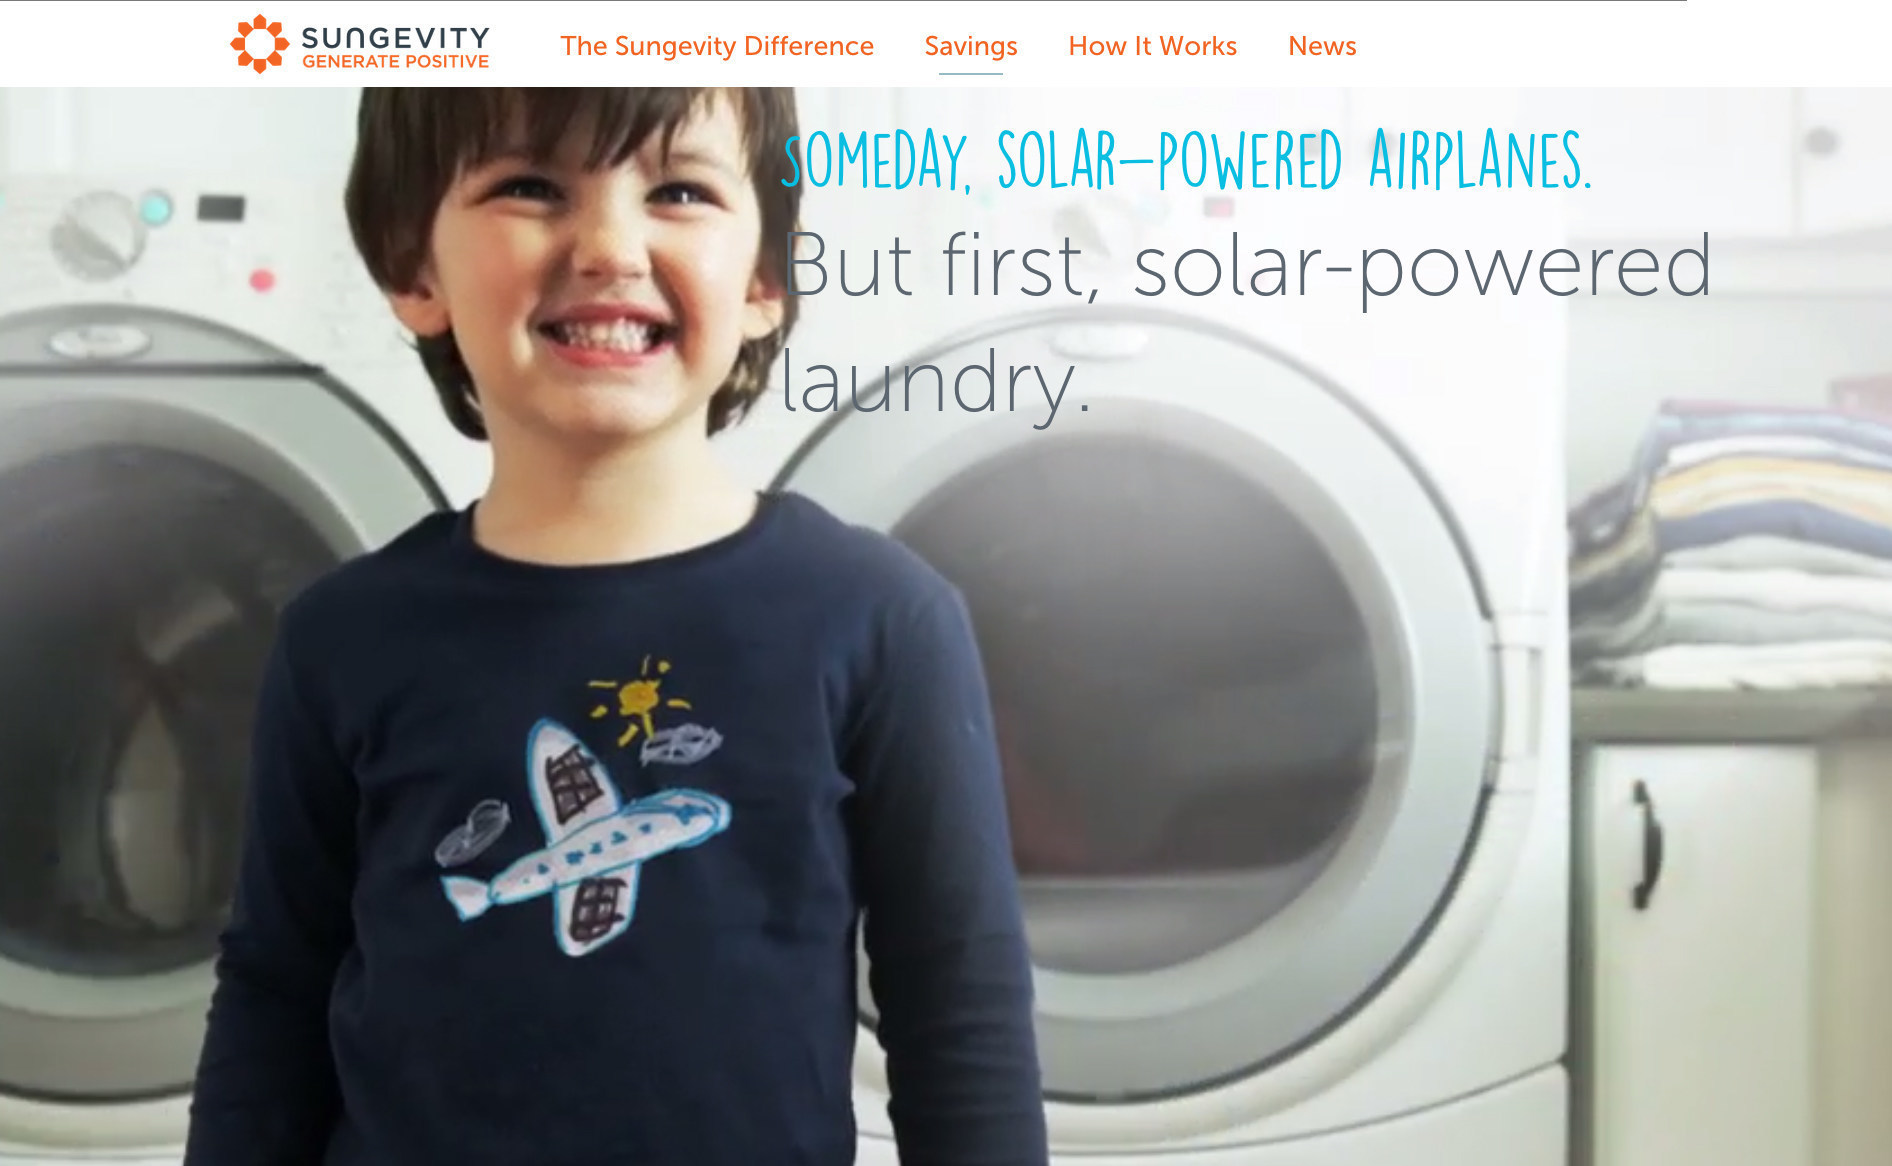 sungevity-webpage-capture